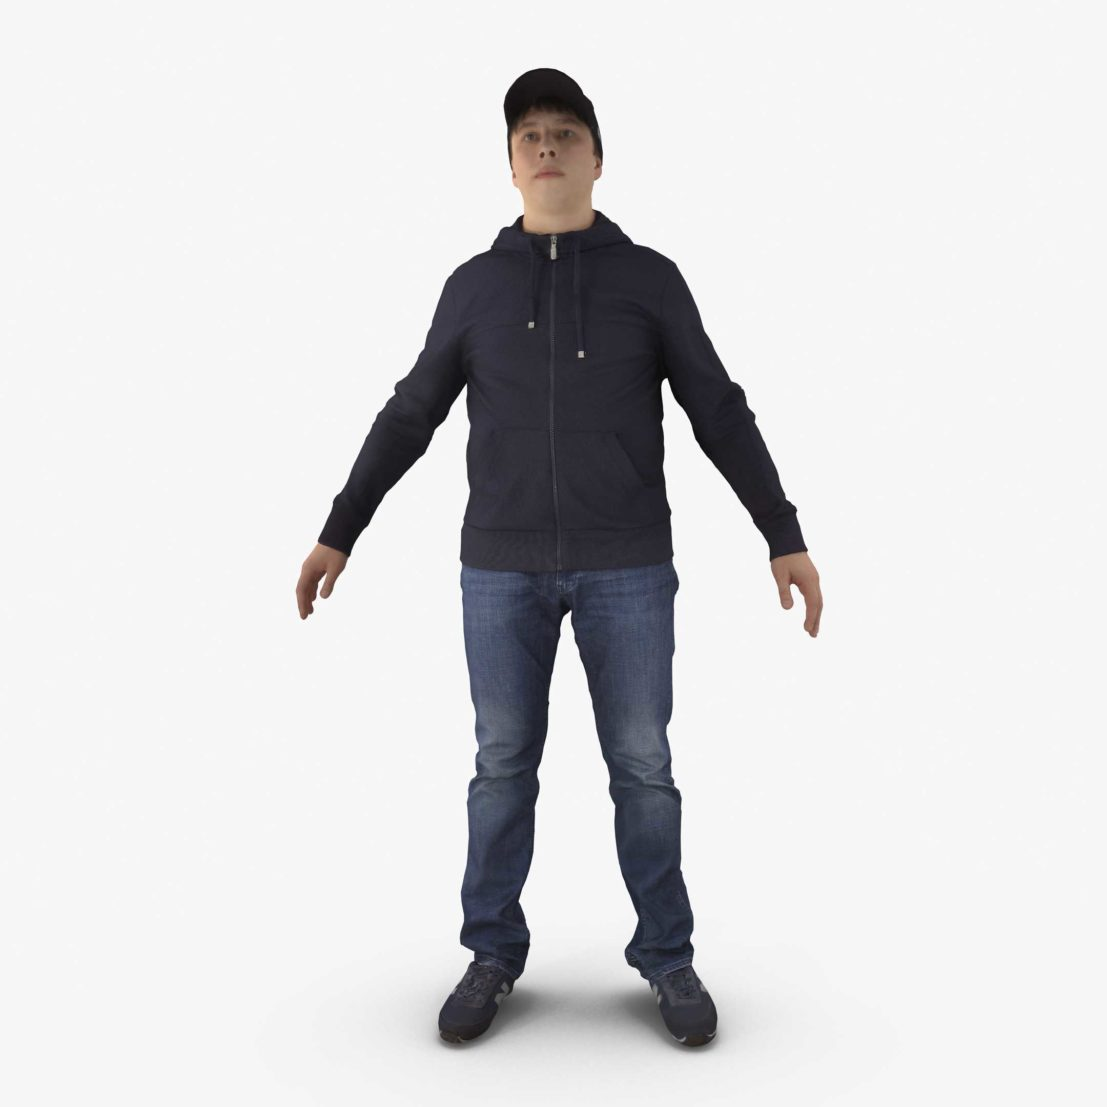 Casual Human APose 3D Model   3DTree Scanning Studio